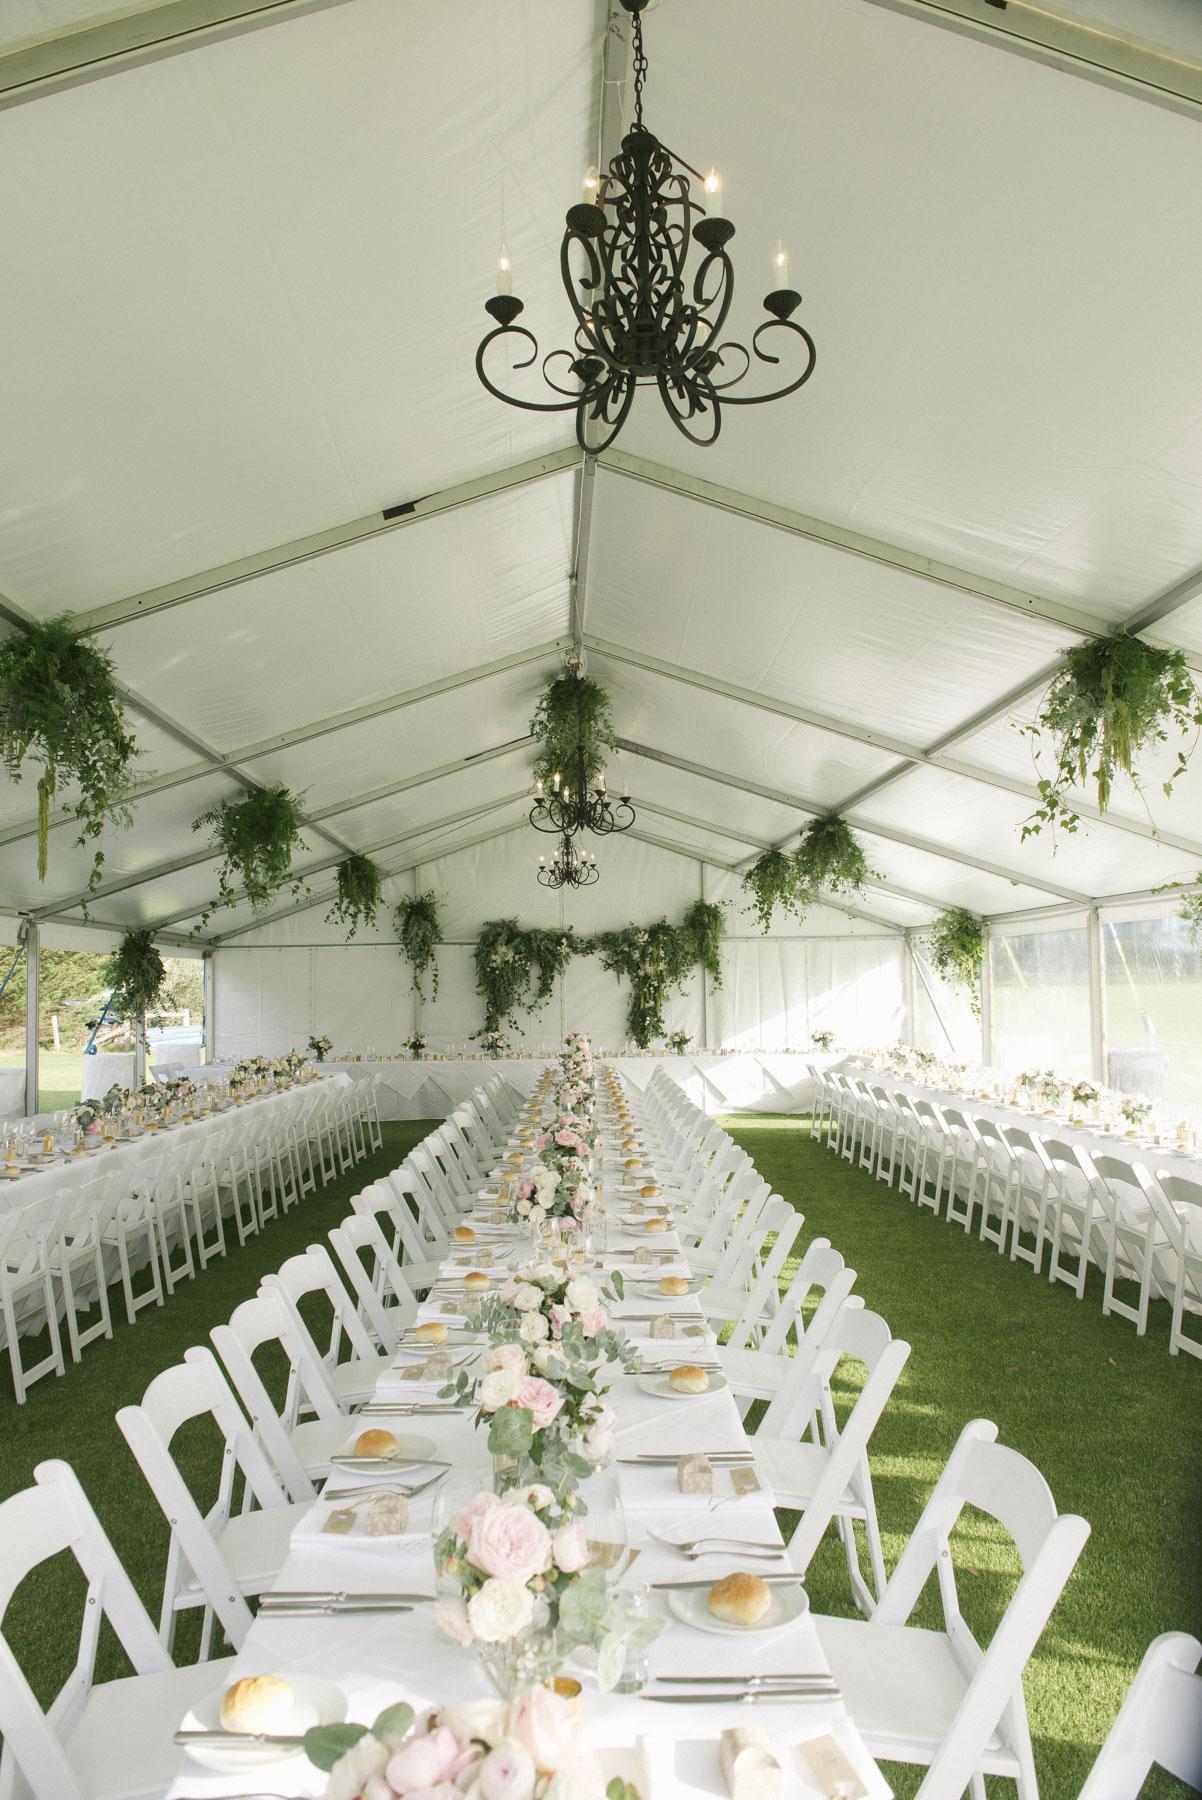 1501vand-279alan_moyle_wedding_portrait_brighton_bayside_werribee_estate_mansion_zoo_rustic_styled_garden_mansion_candid_documentry_victoria_whitelaw.jpg